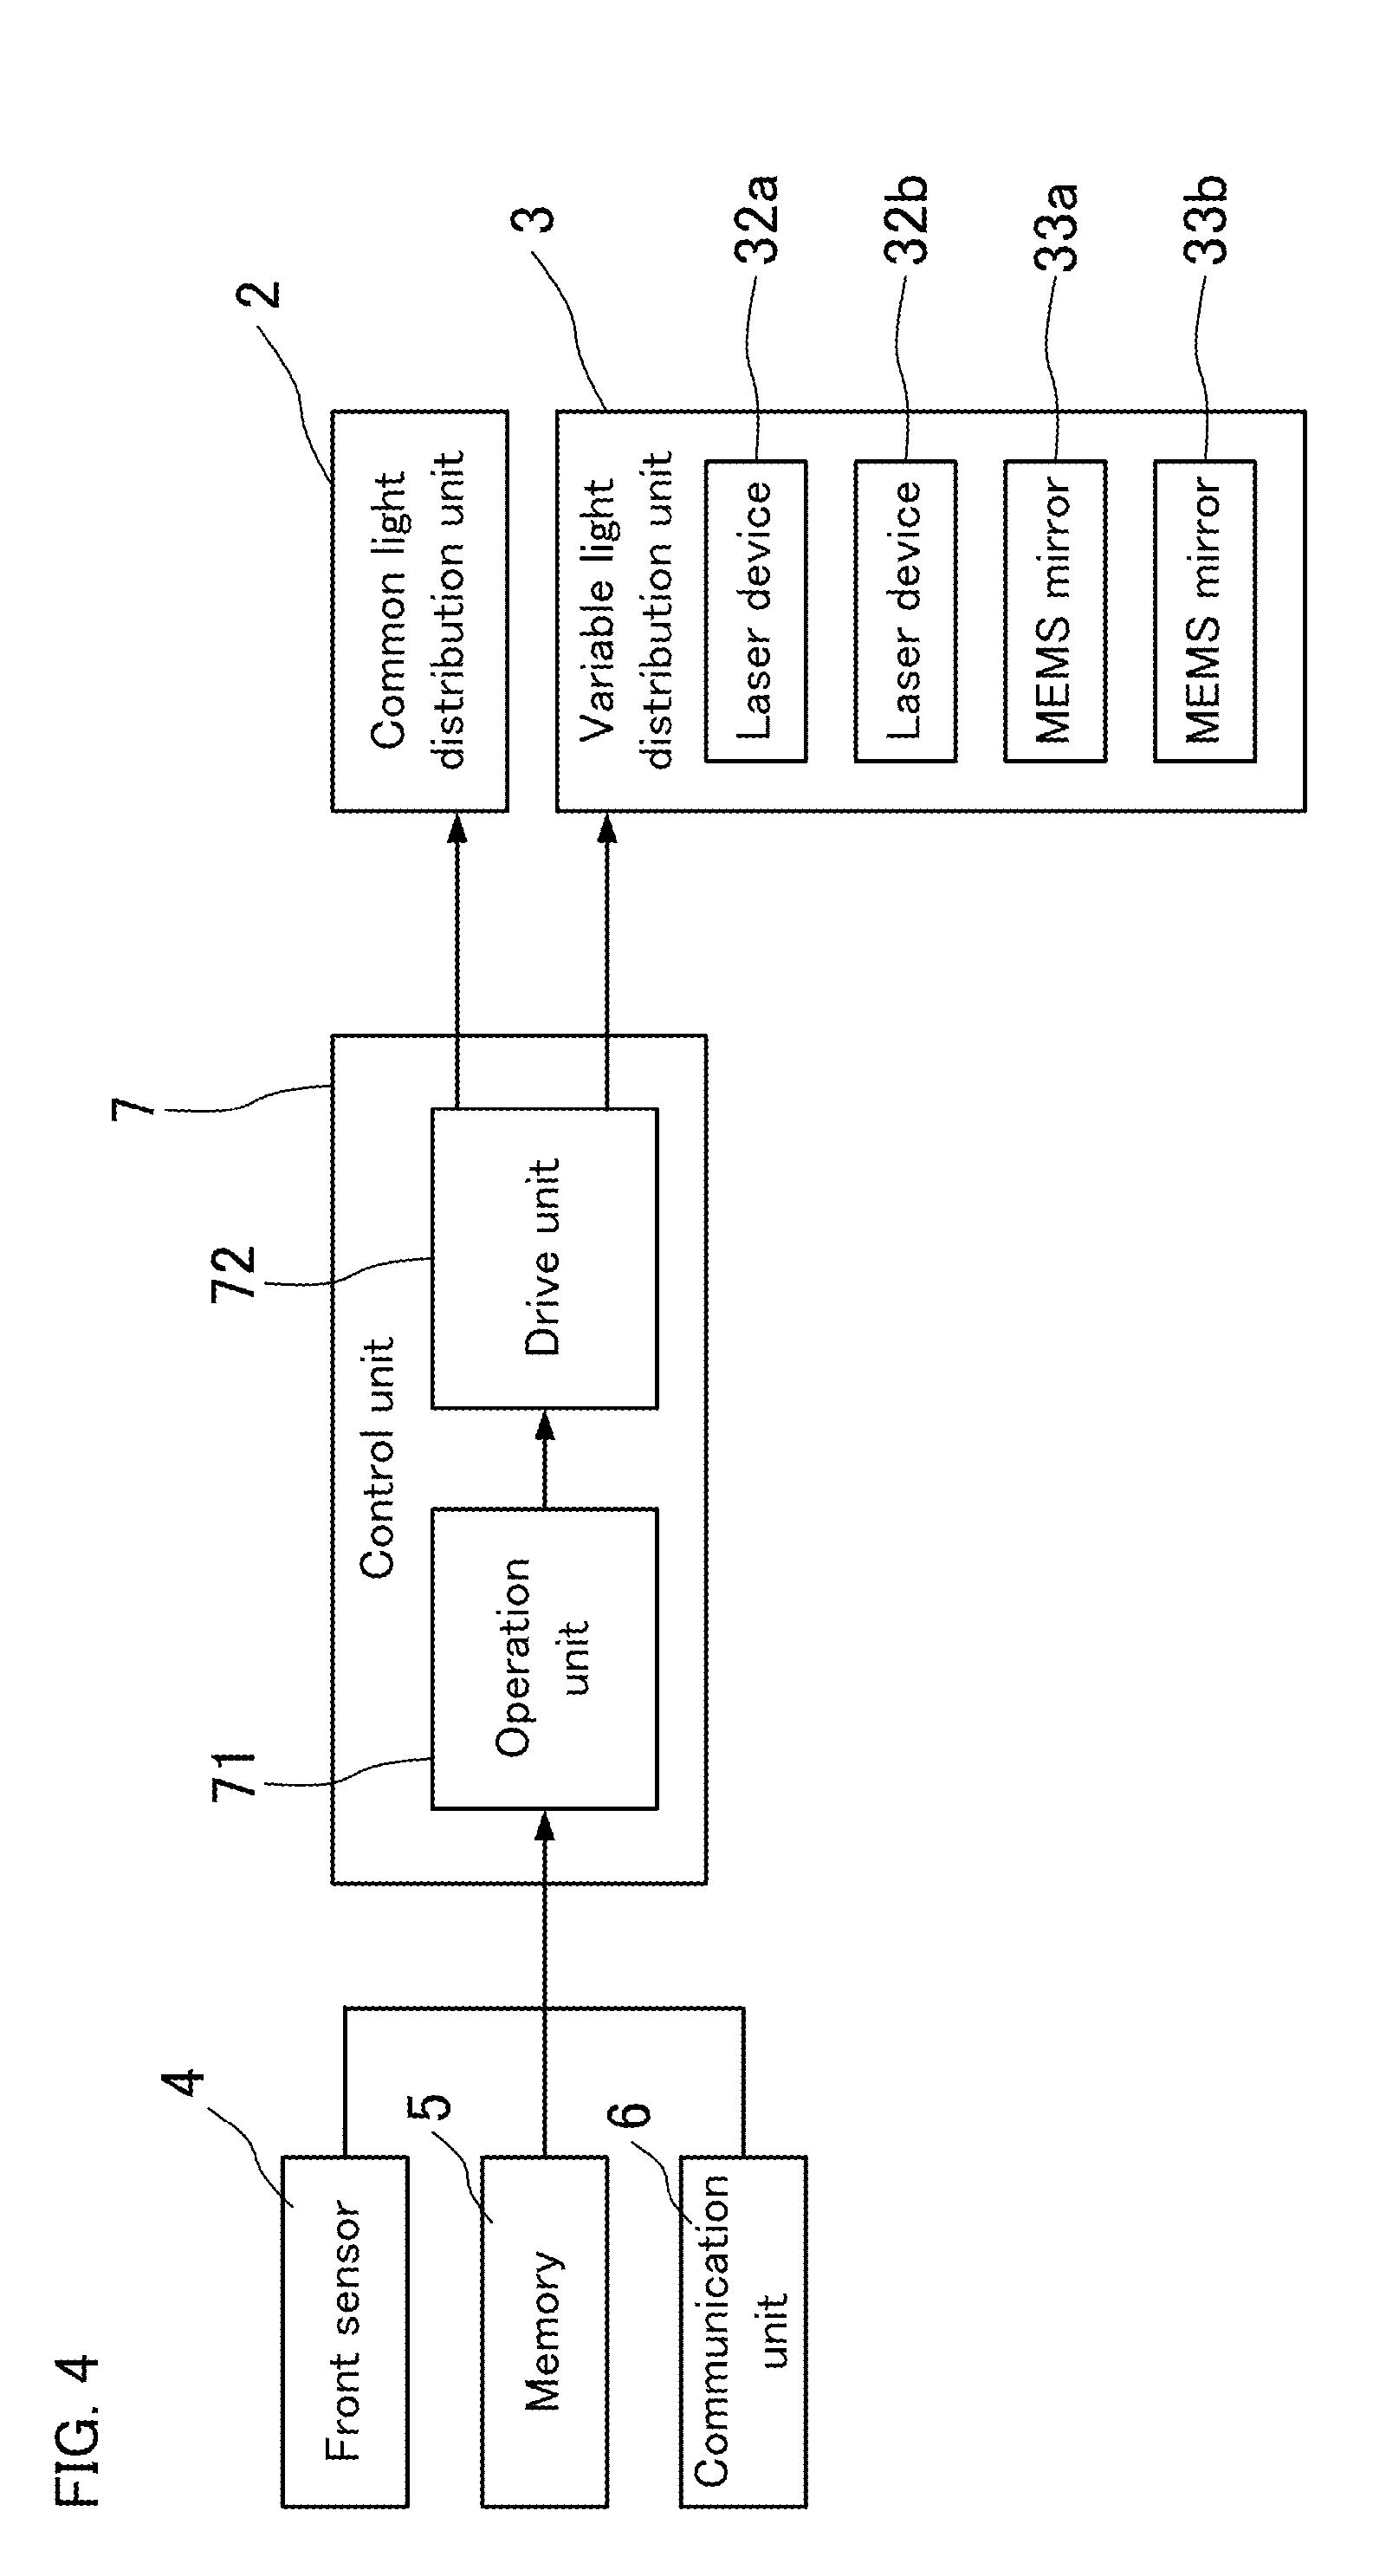 bulldog radio wiring diagram using a venn to compare and contrast hyundai accent central locking new era of